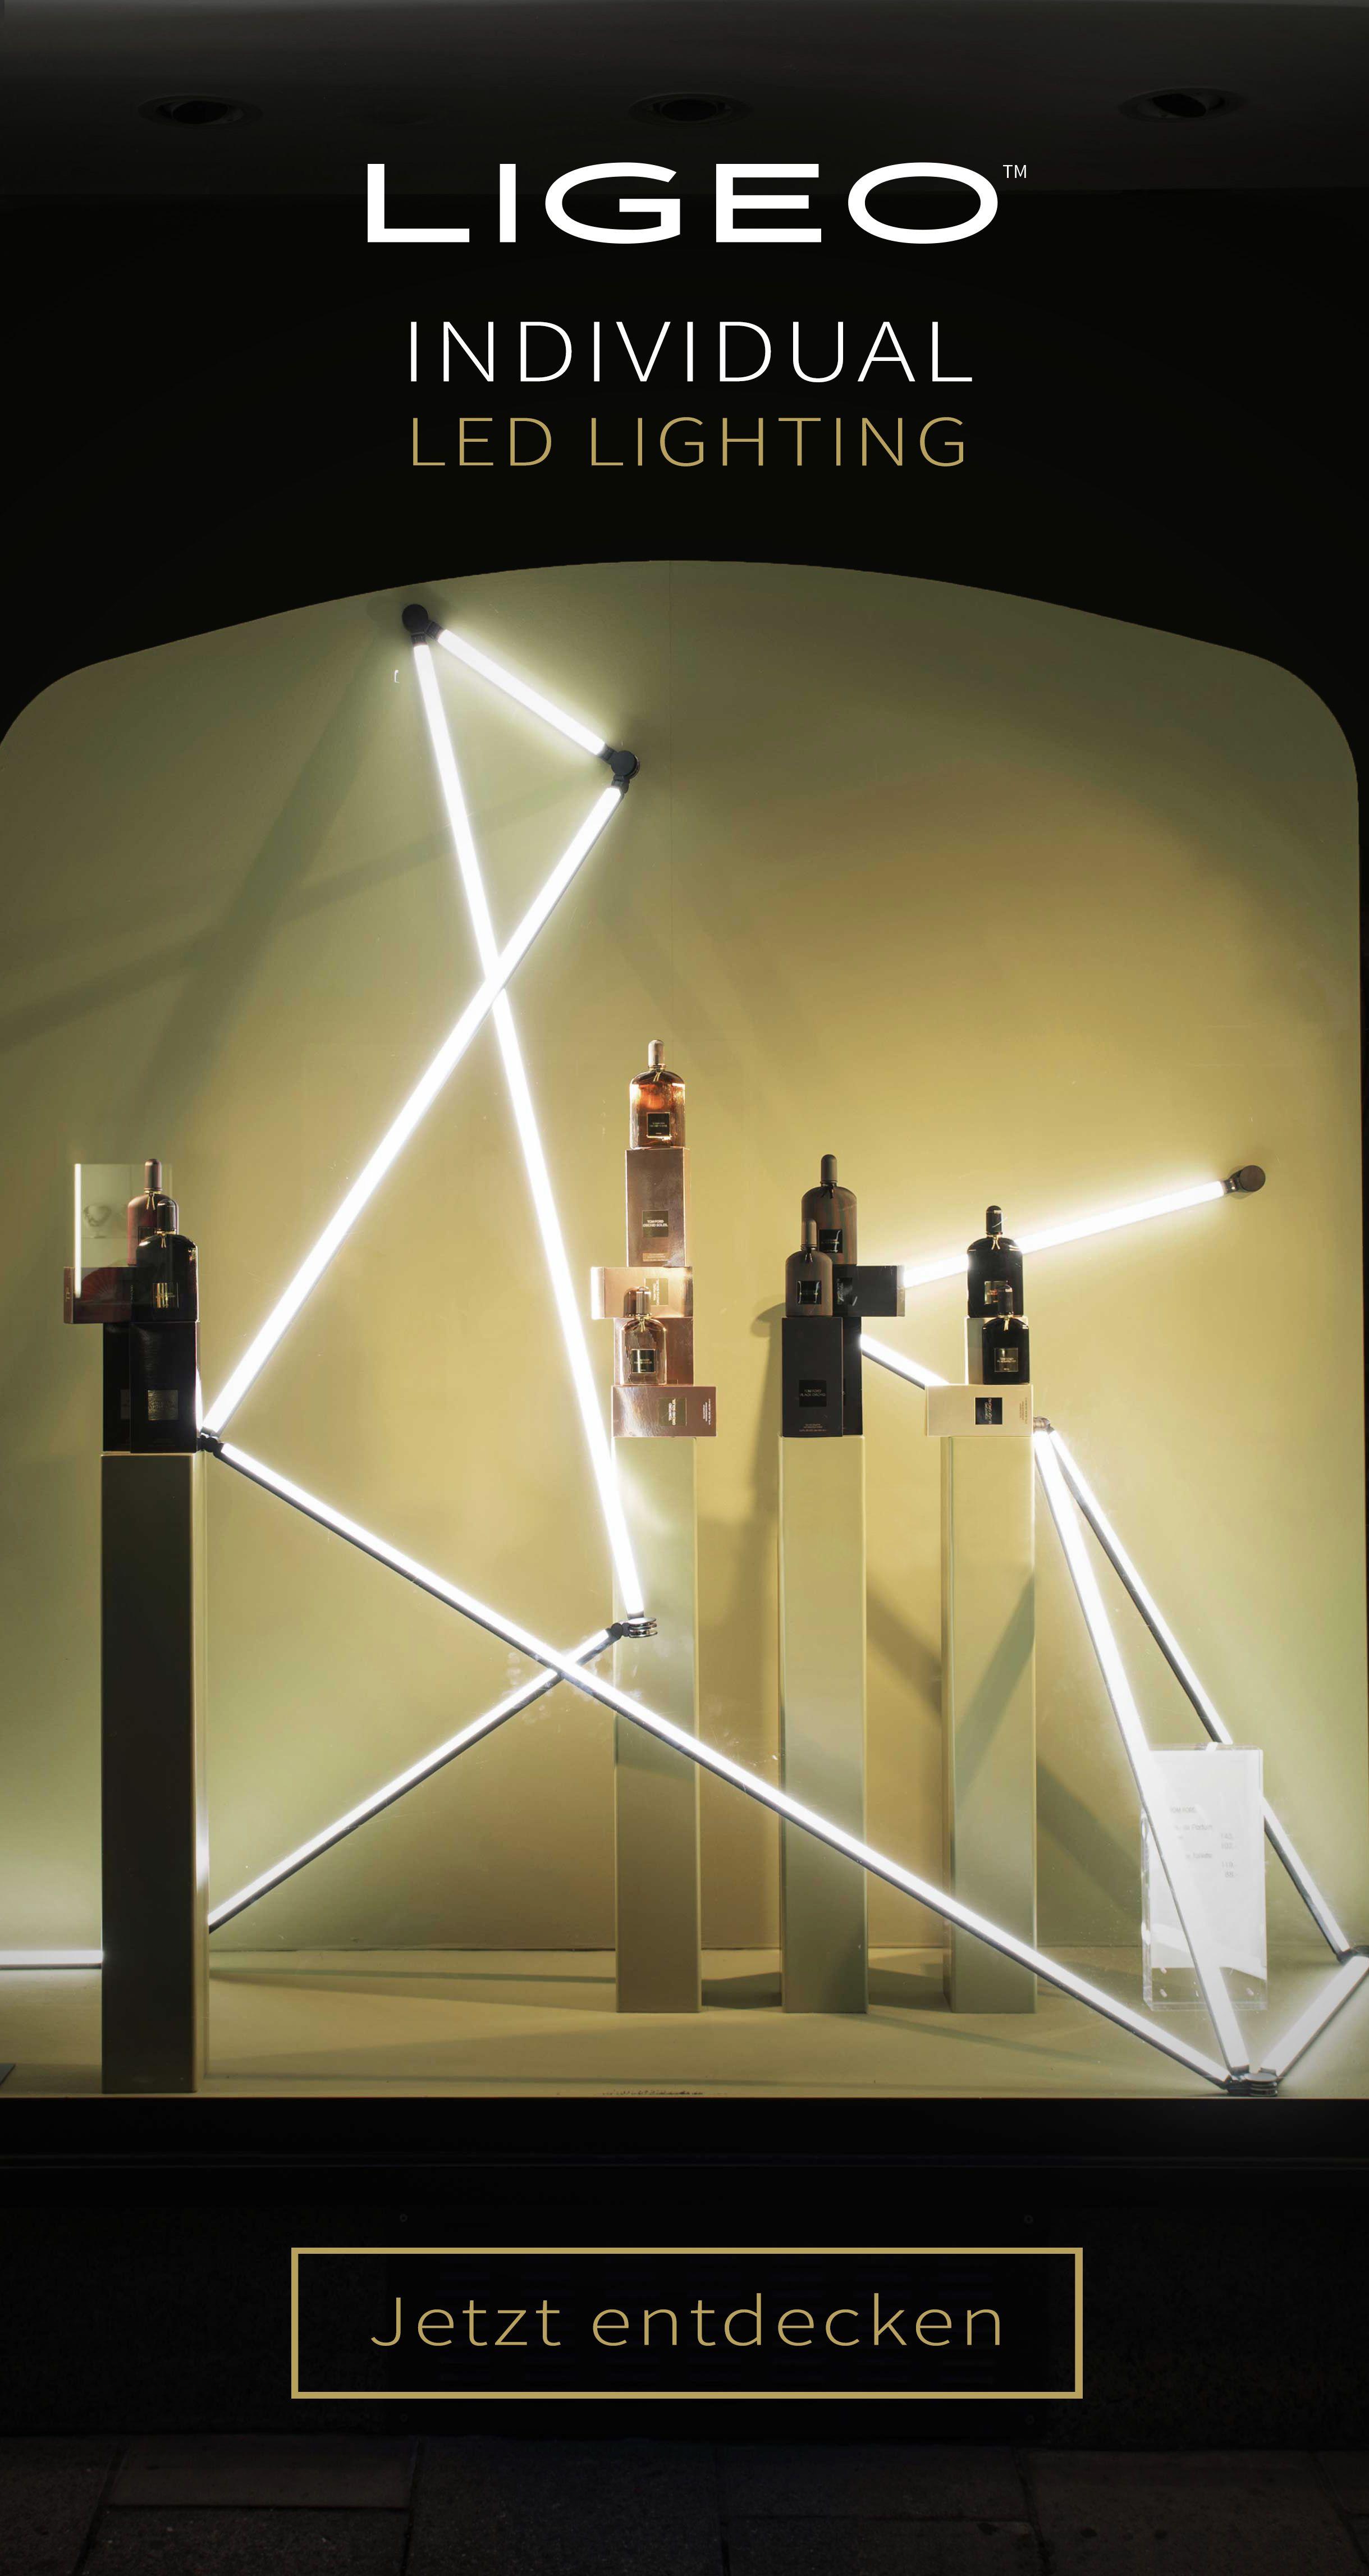 Led Beleuchtung Fur Retail Stores Und Ladenbau In 2020 Led Led Leuchten Led Stab